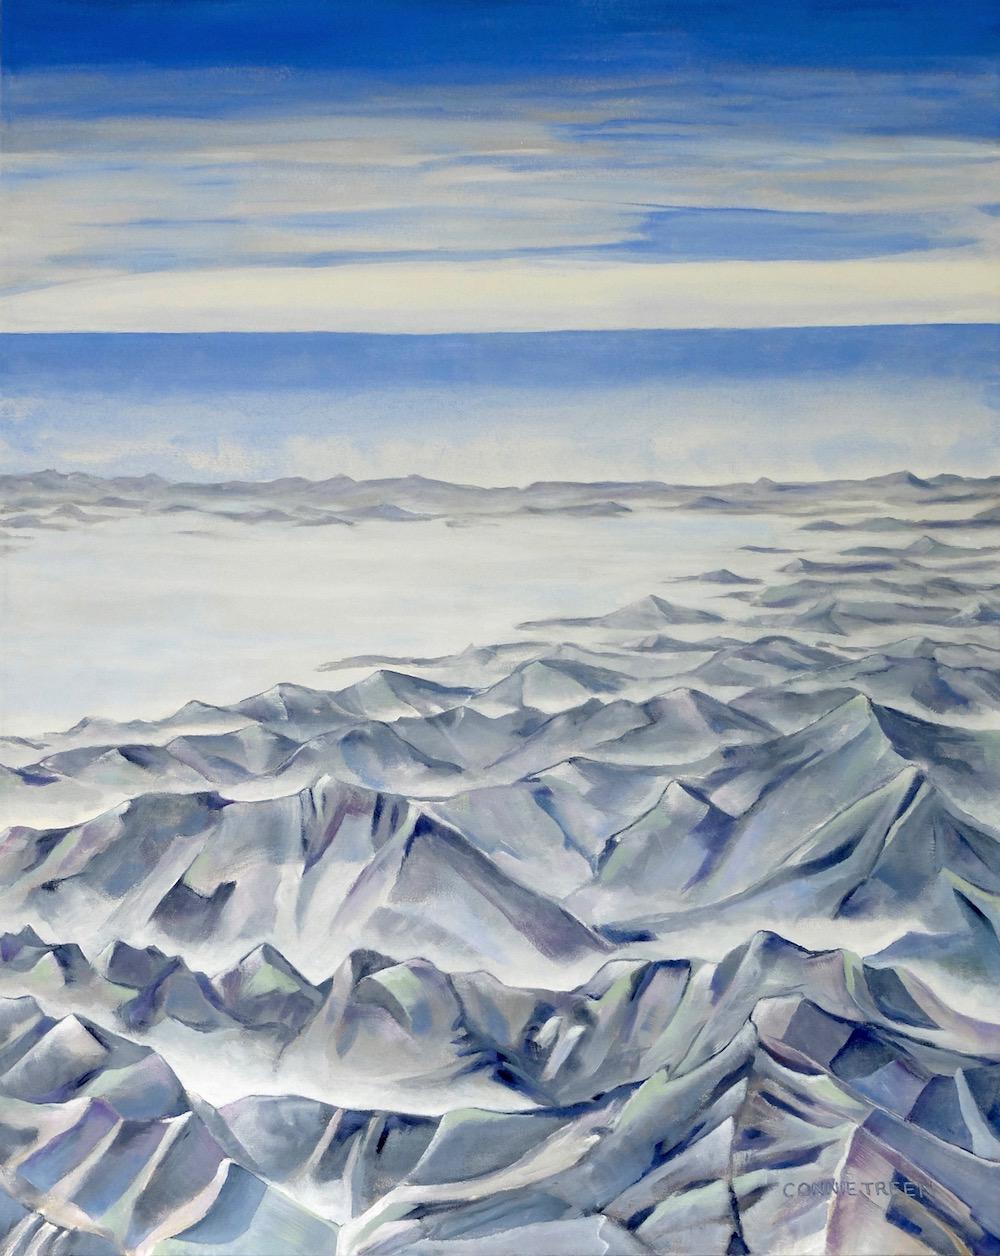 The Alps - Serenity